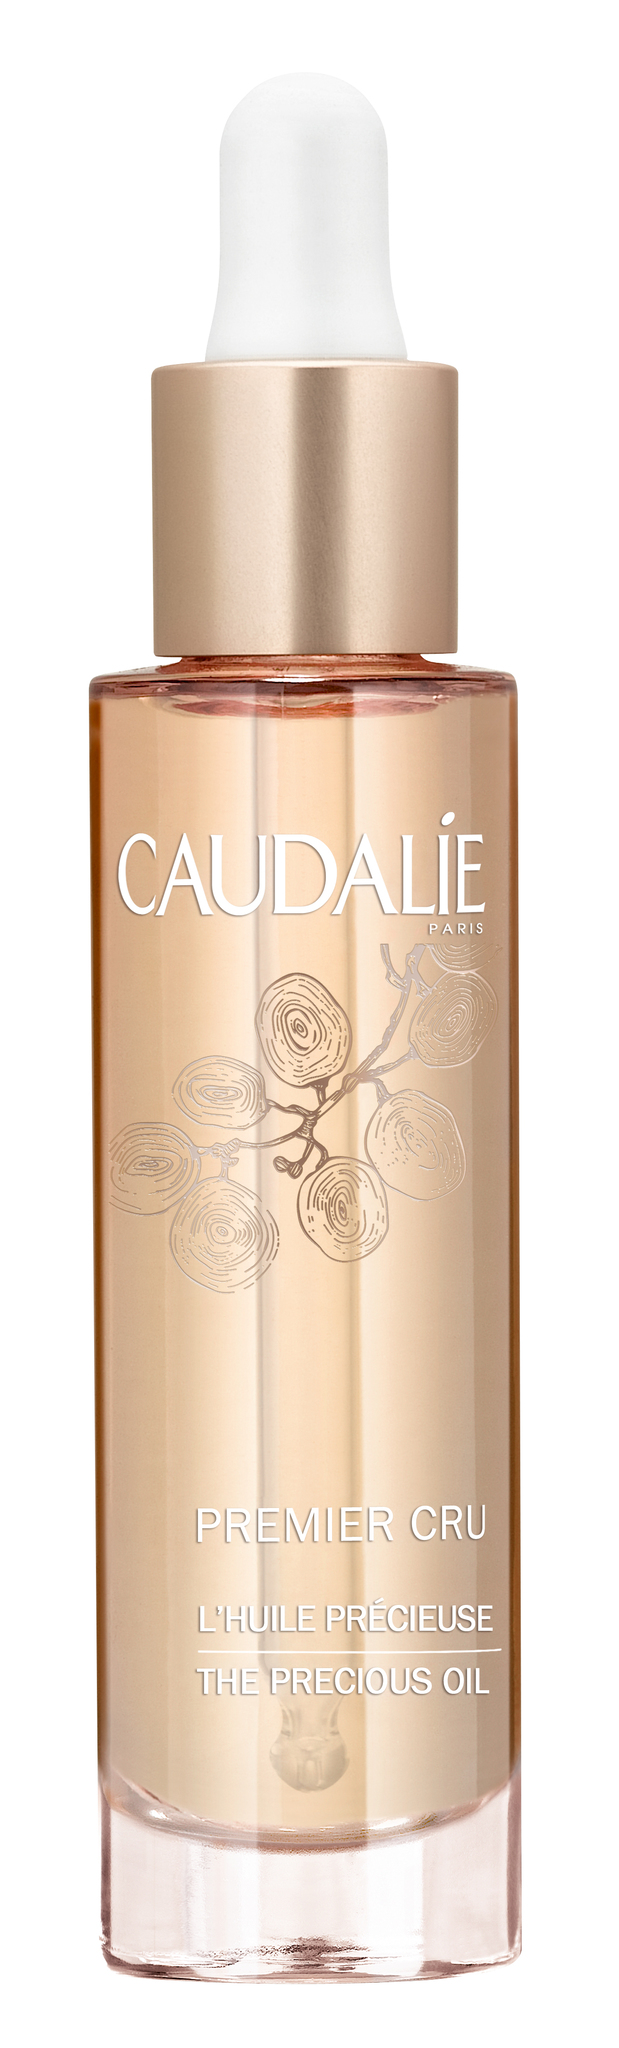 Caudalie - Premier Cru Precious Oil 29 ml